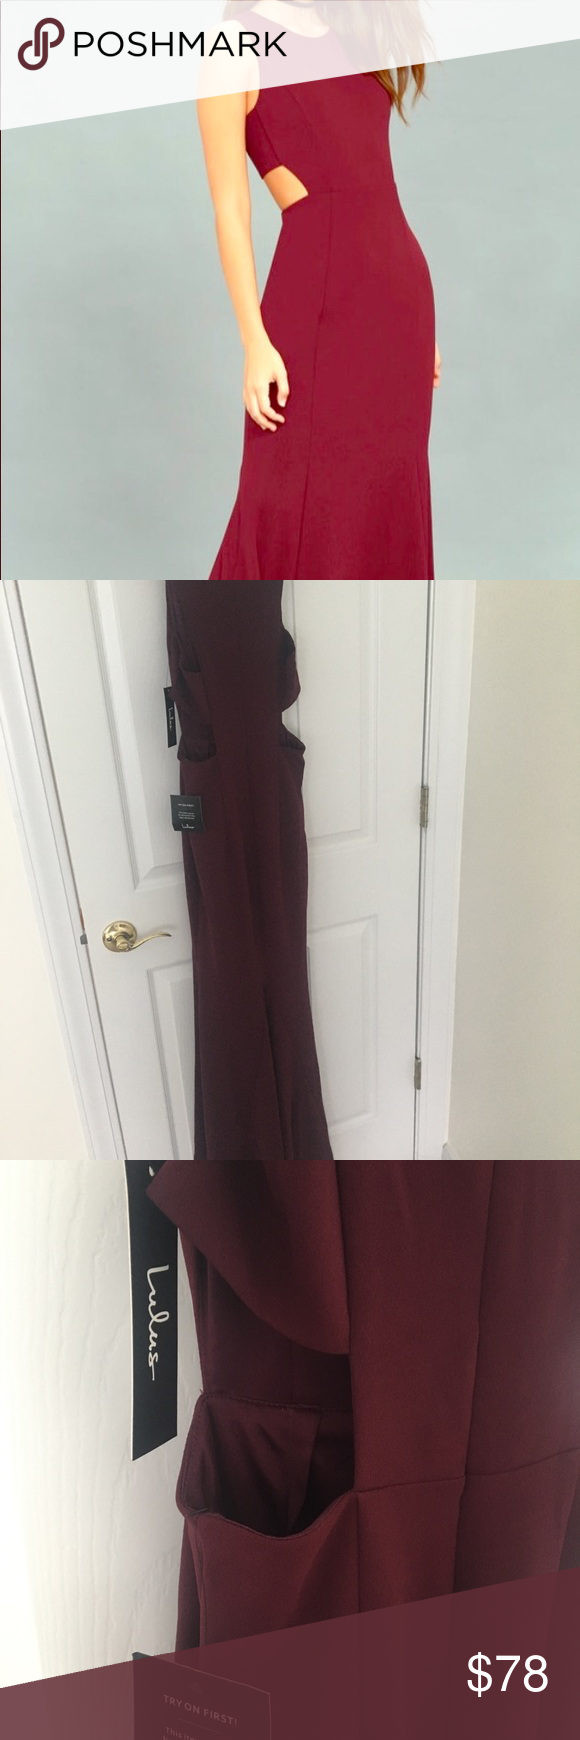 Lulus wedding guest dress  Luluus size XS burgundy BNWT maxi dress  NWT  My Posh Picks